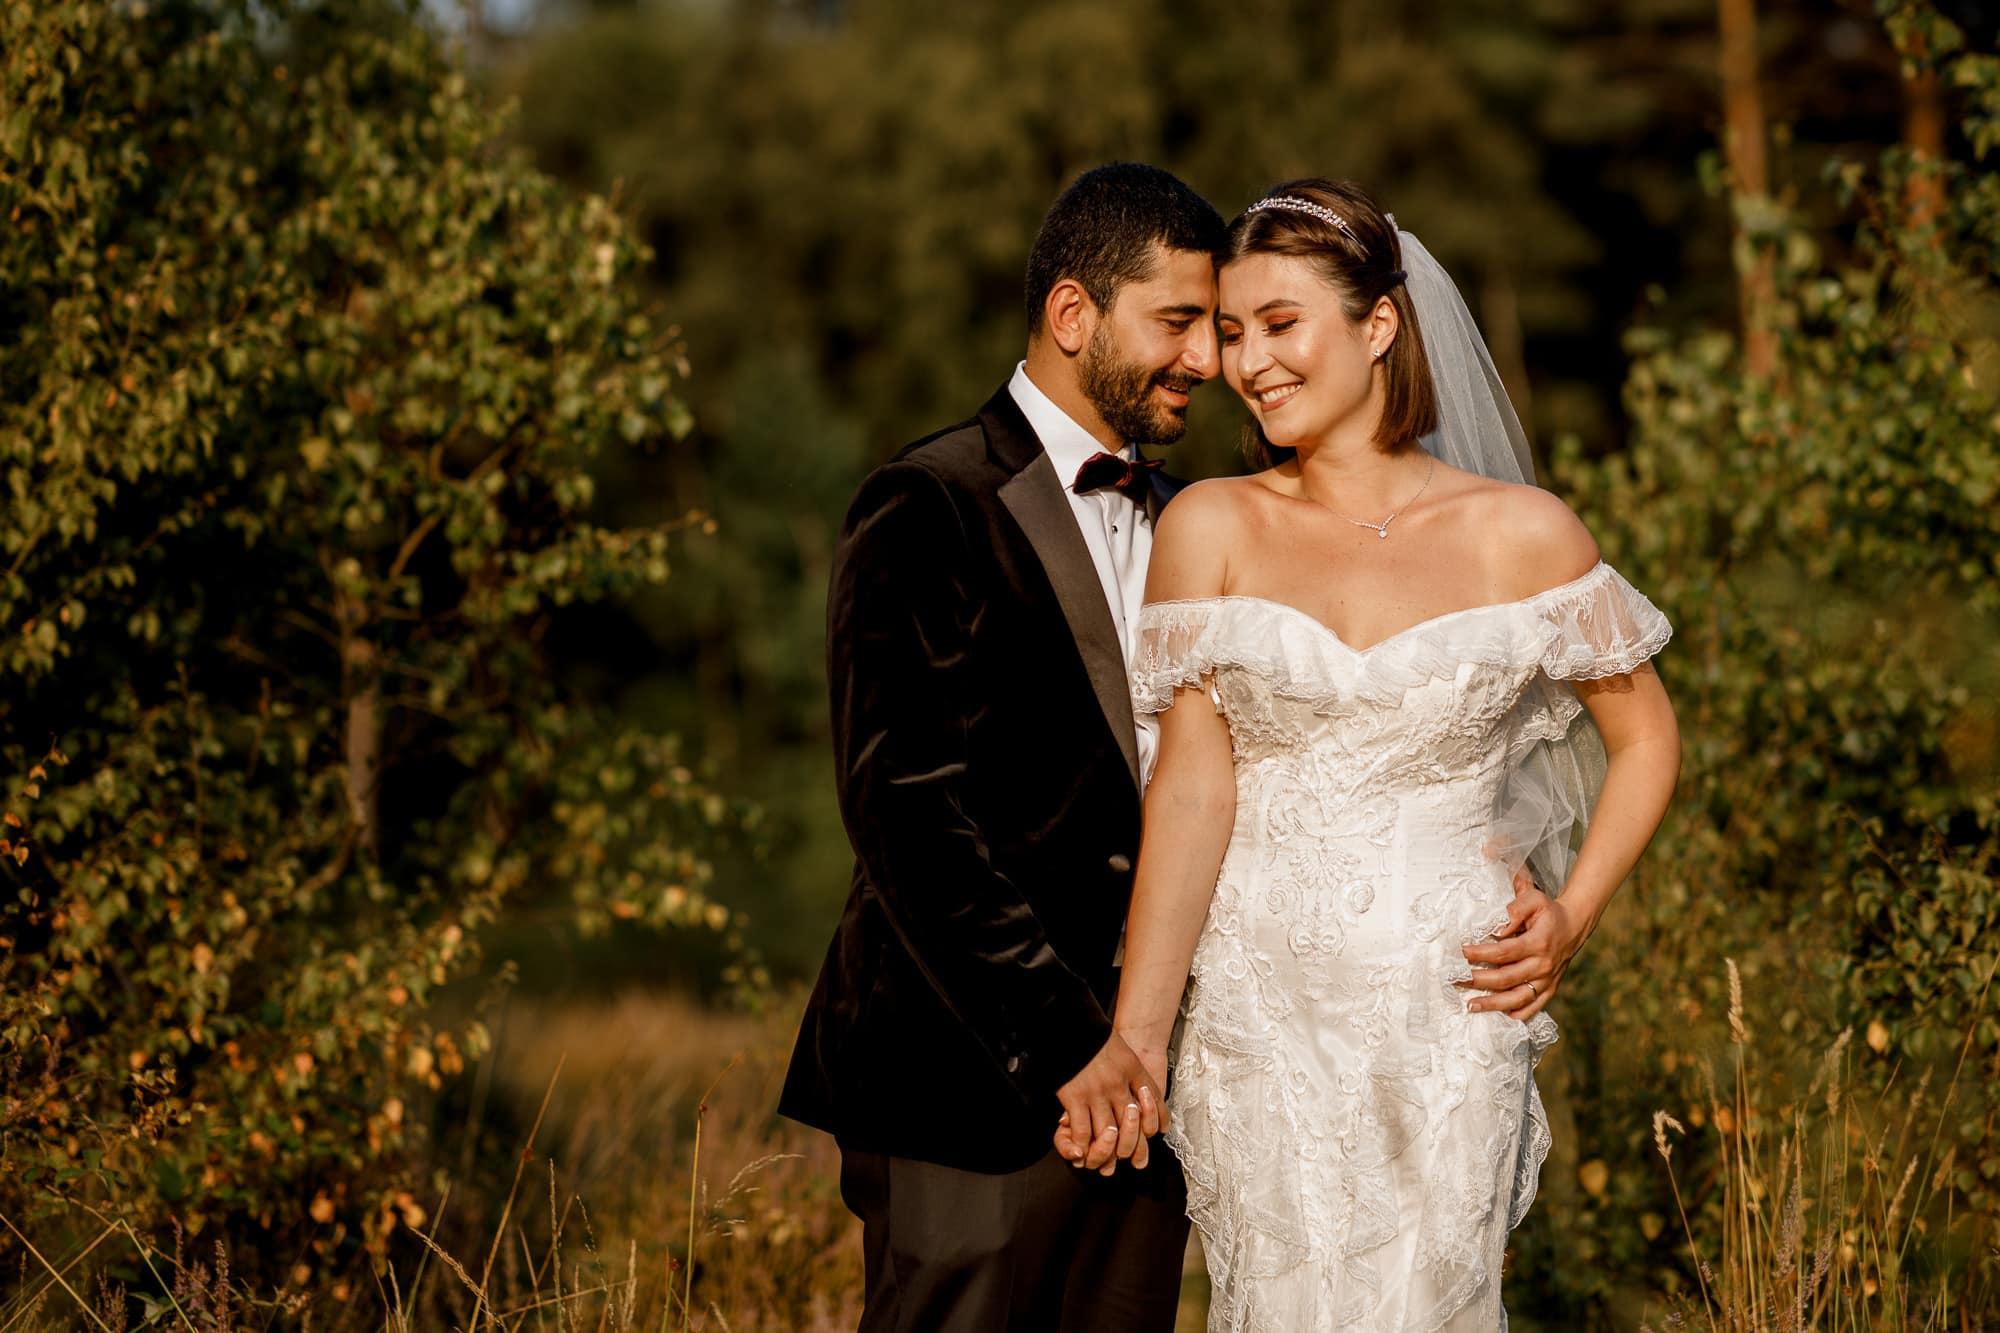 wedding portraits at Burnham Beeches